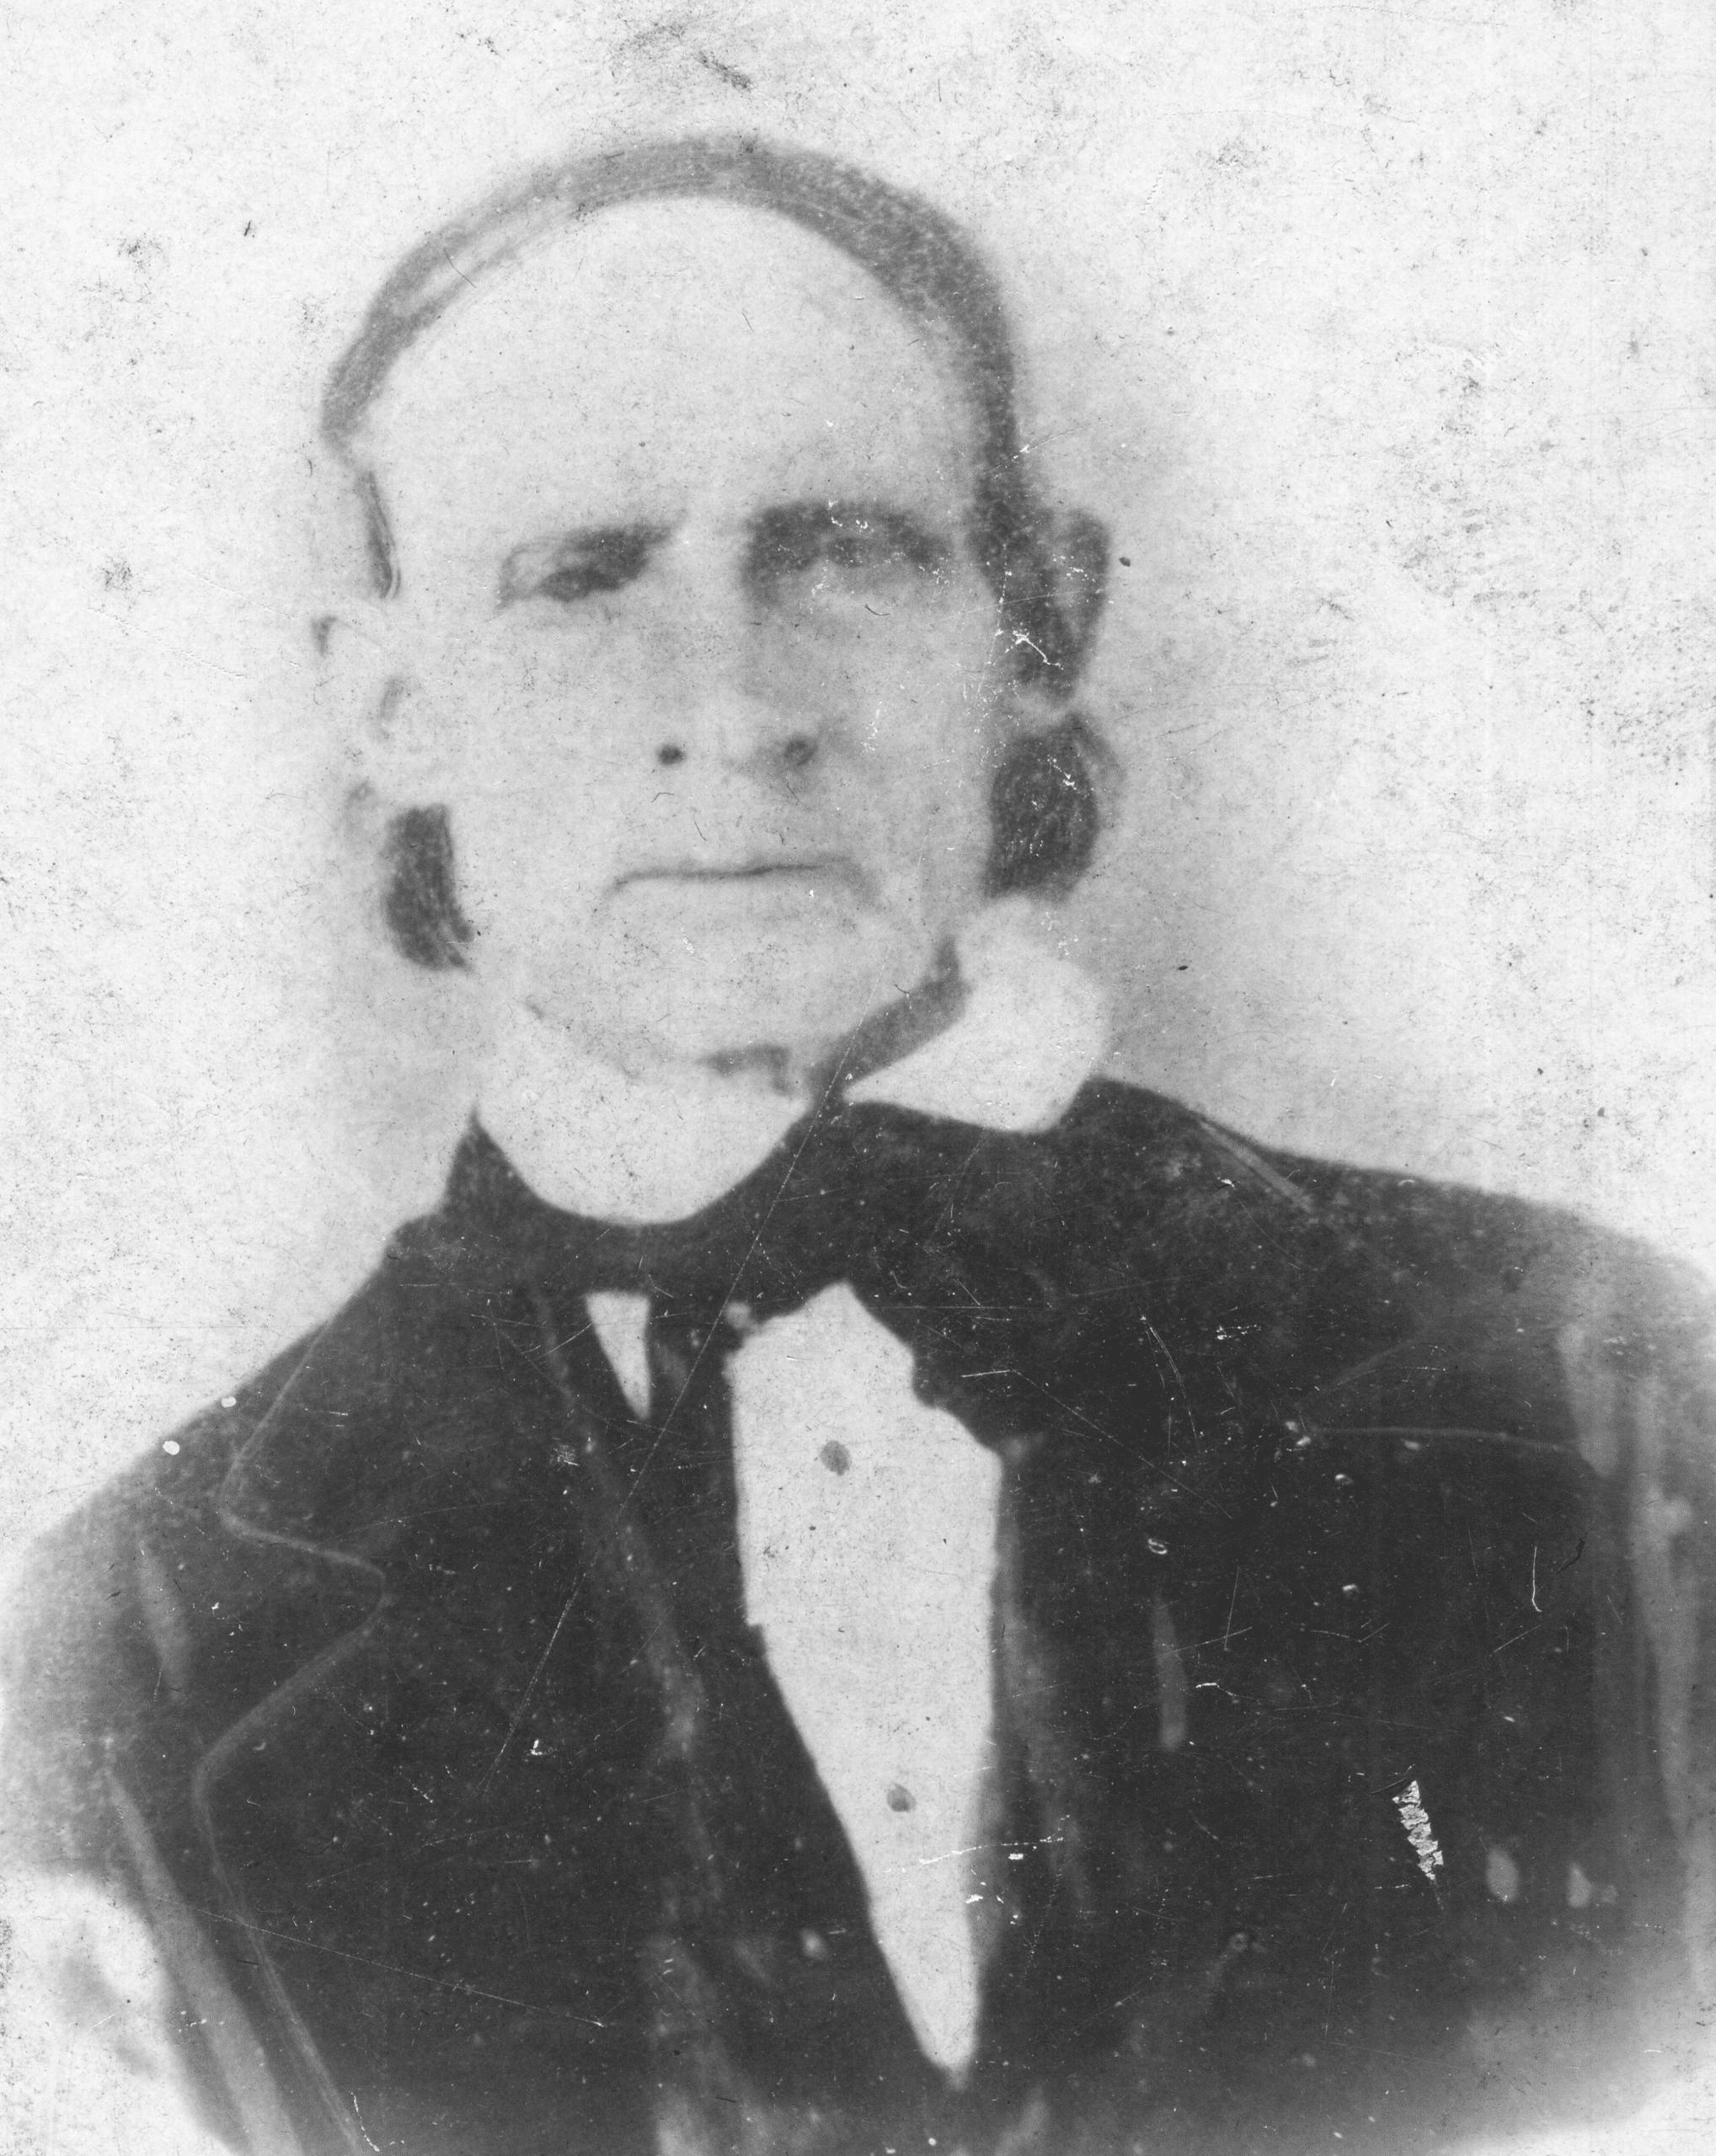 1830's – Judge John Robinson